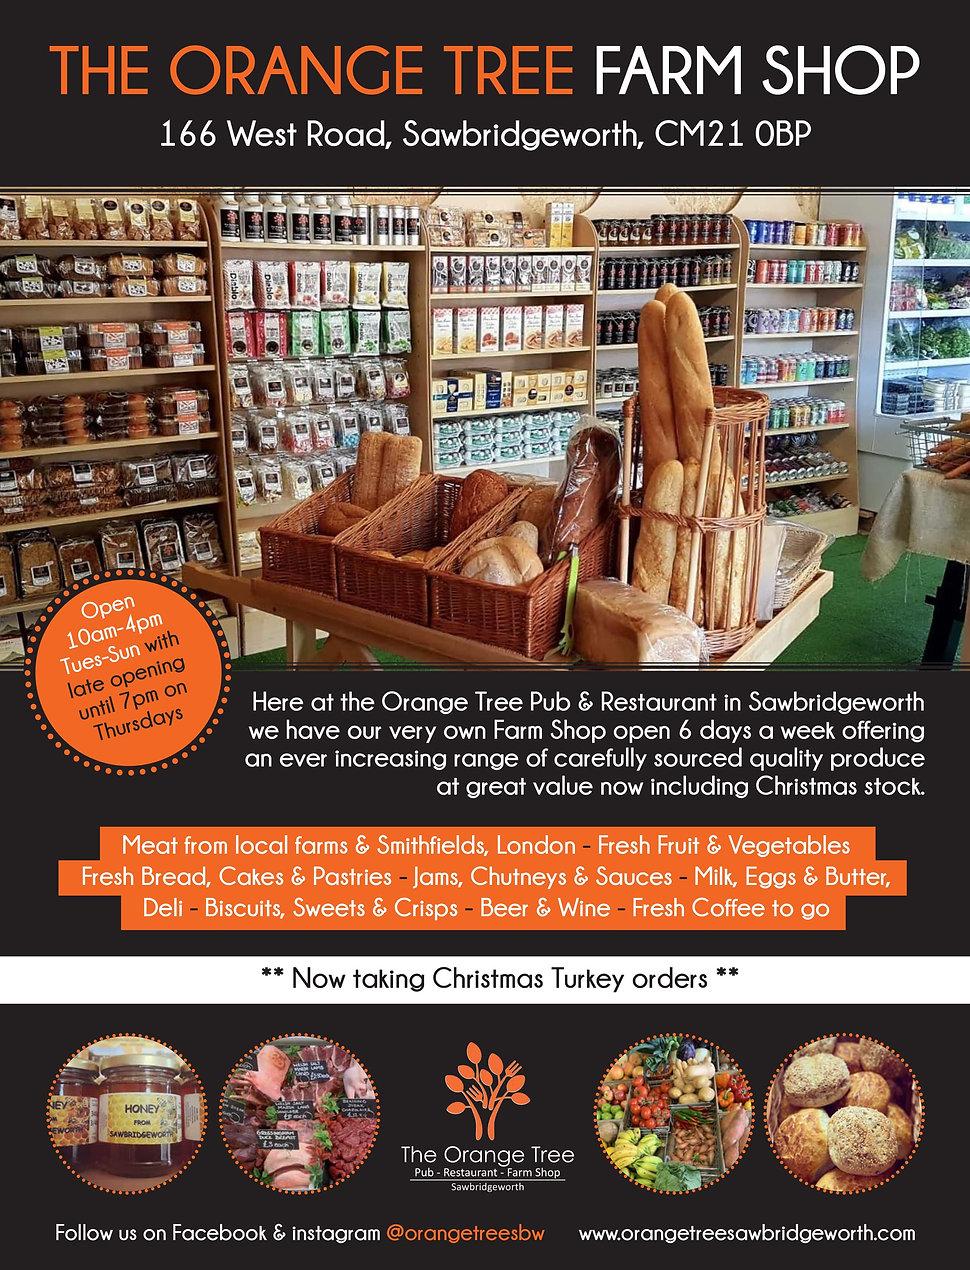 Orange-Tree-Farm-Shop-advert-210x275-min